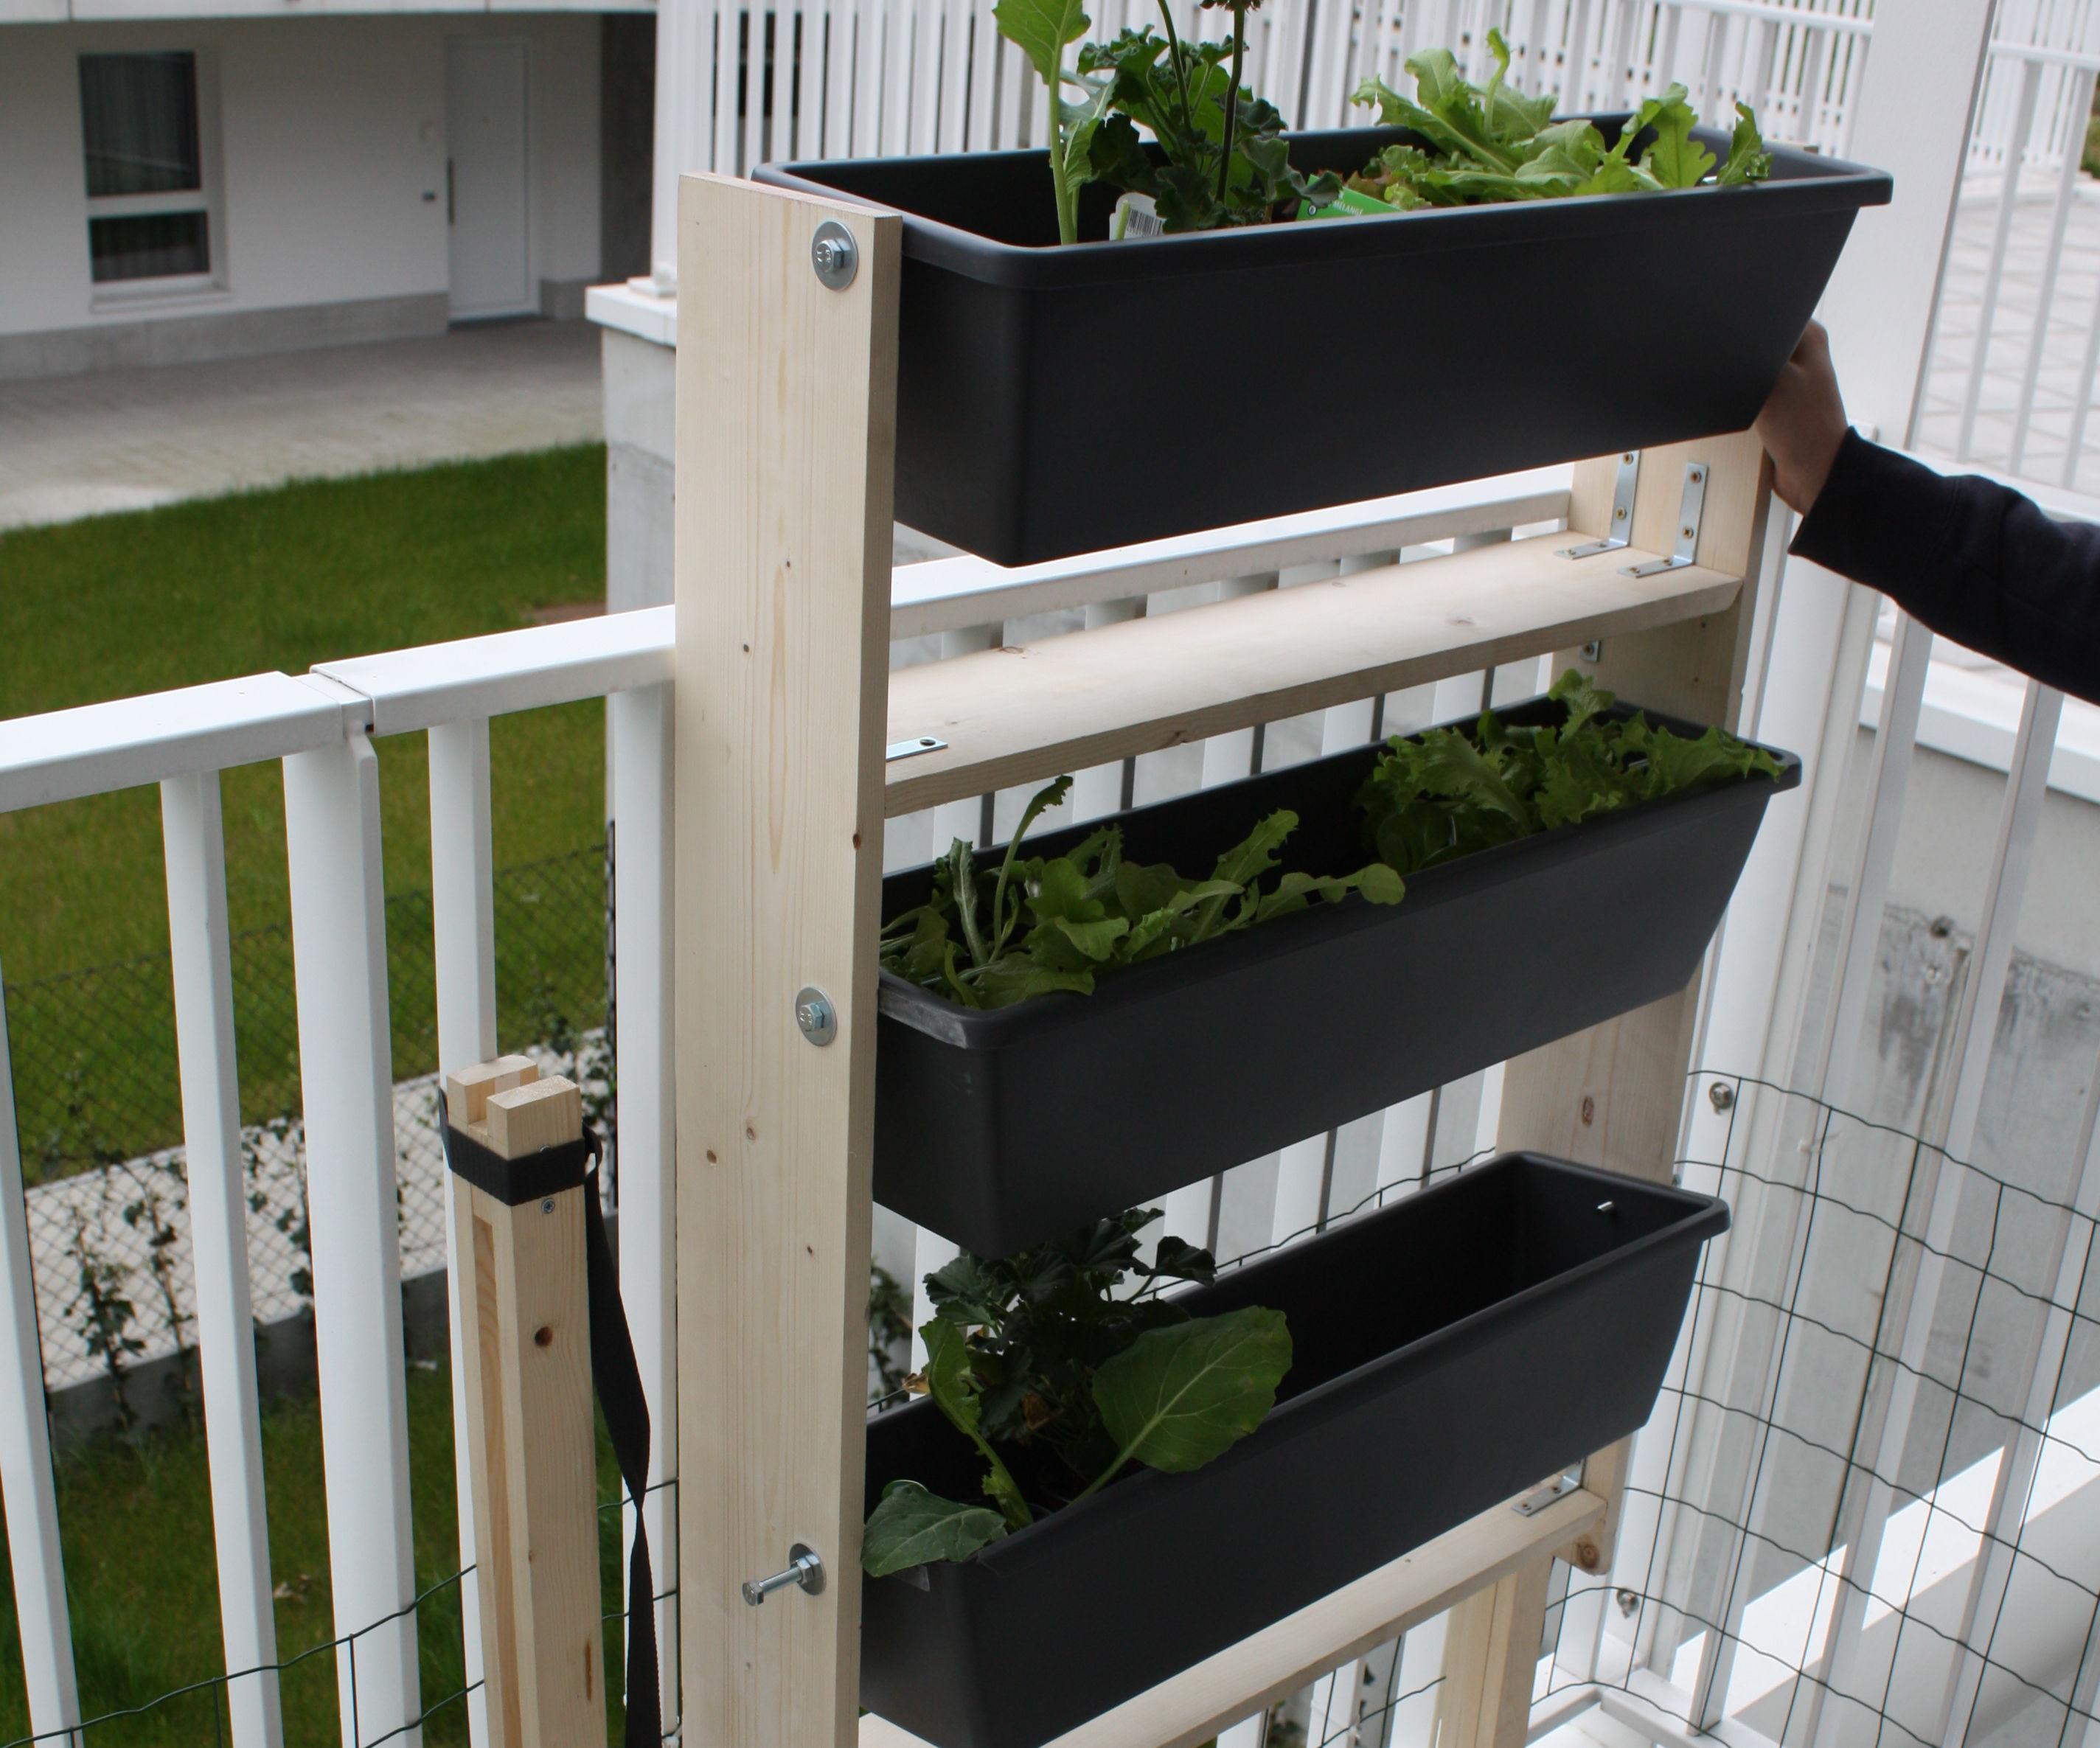 Space Efficient Gardening Rack